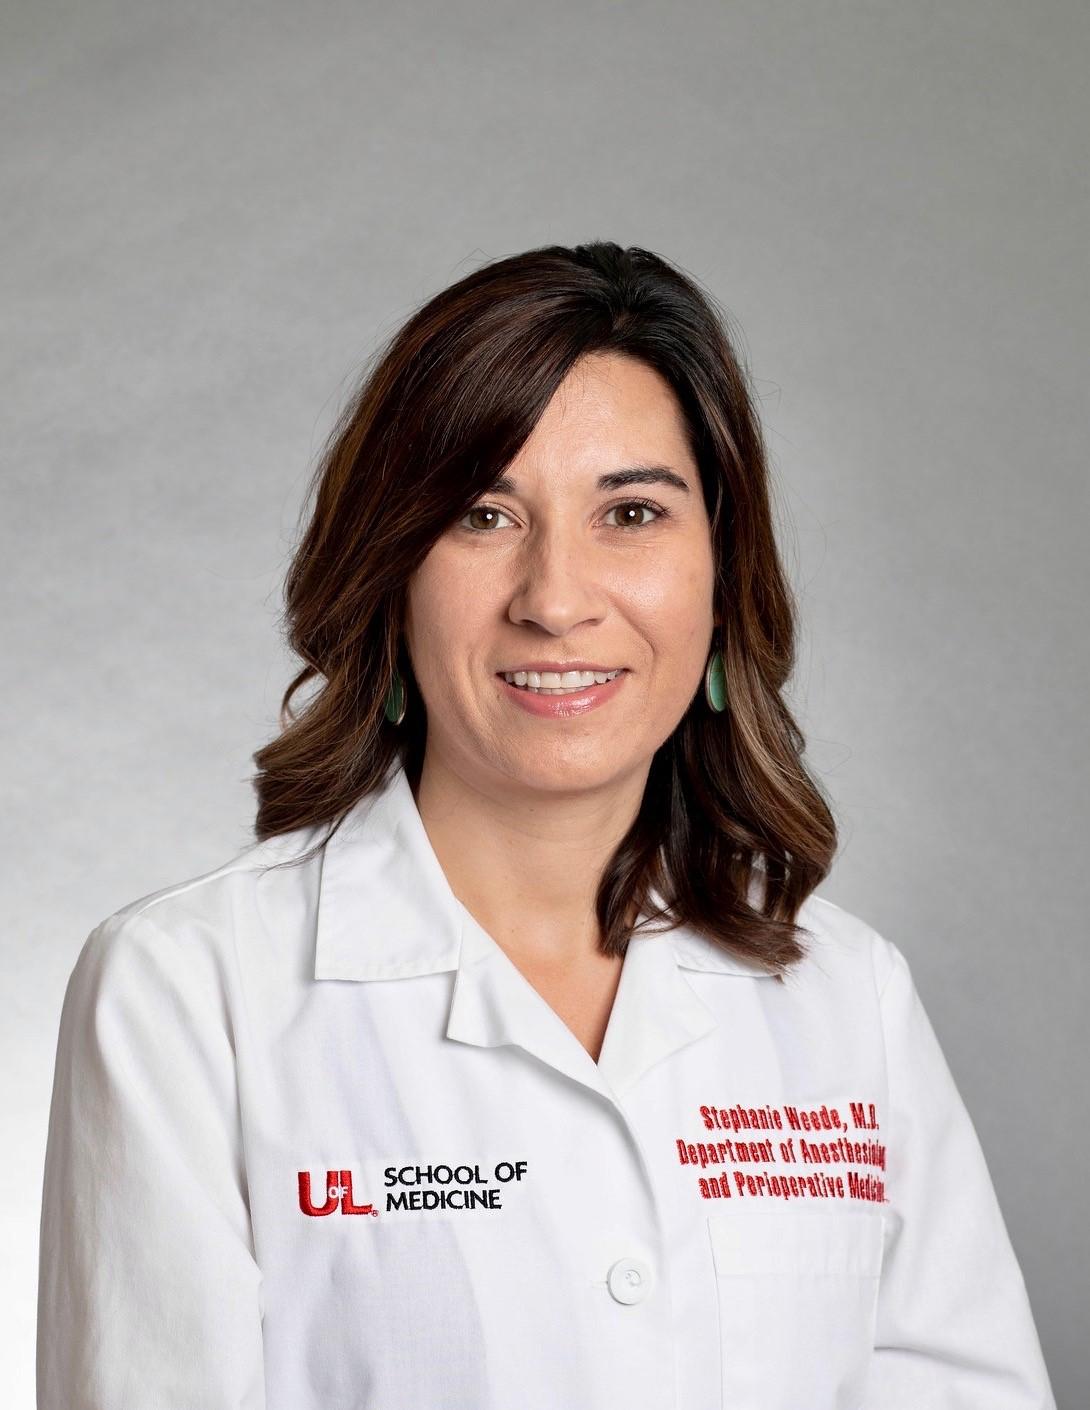 Dr. Stephanie Weede